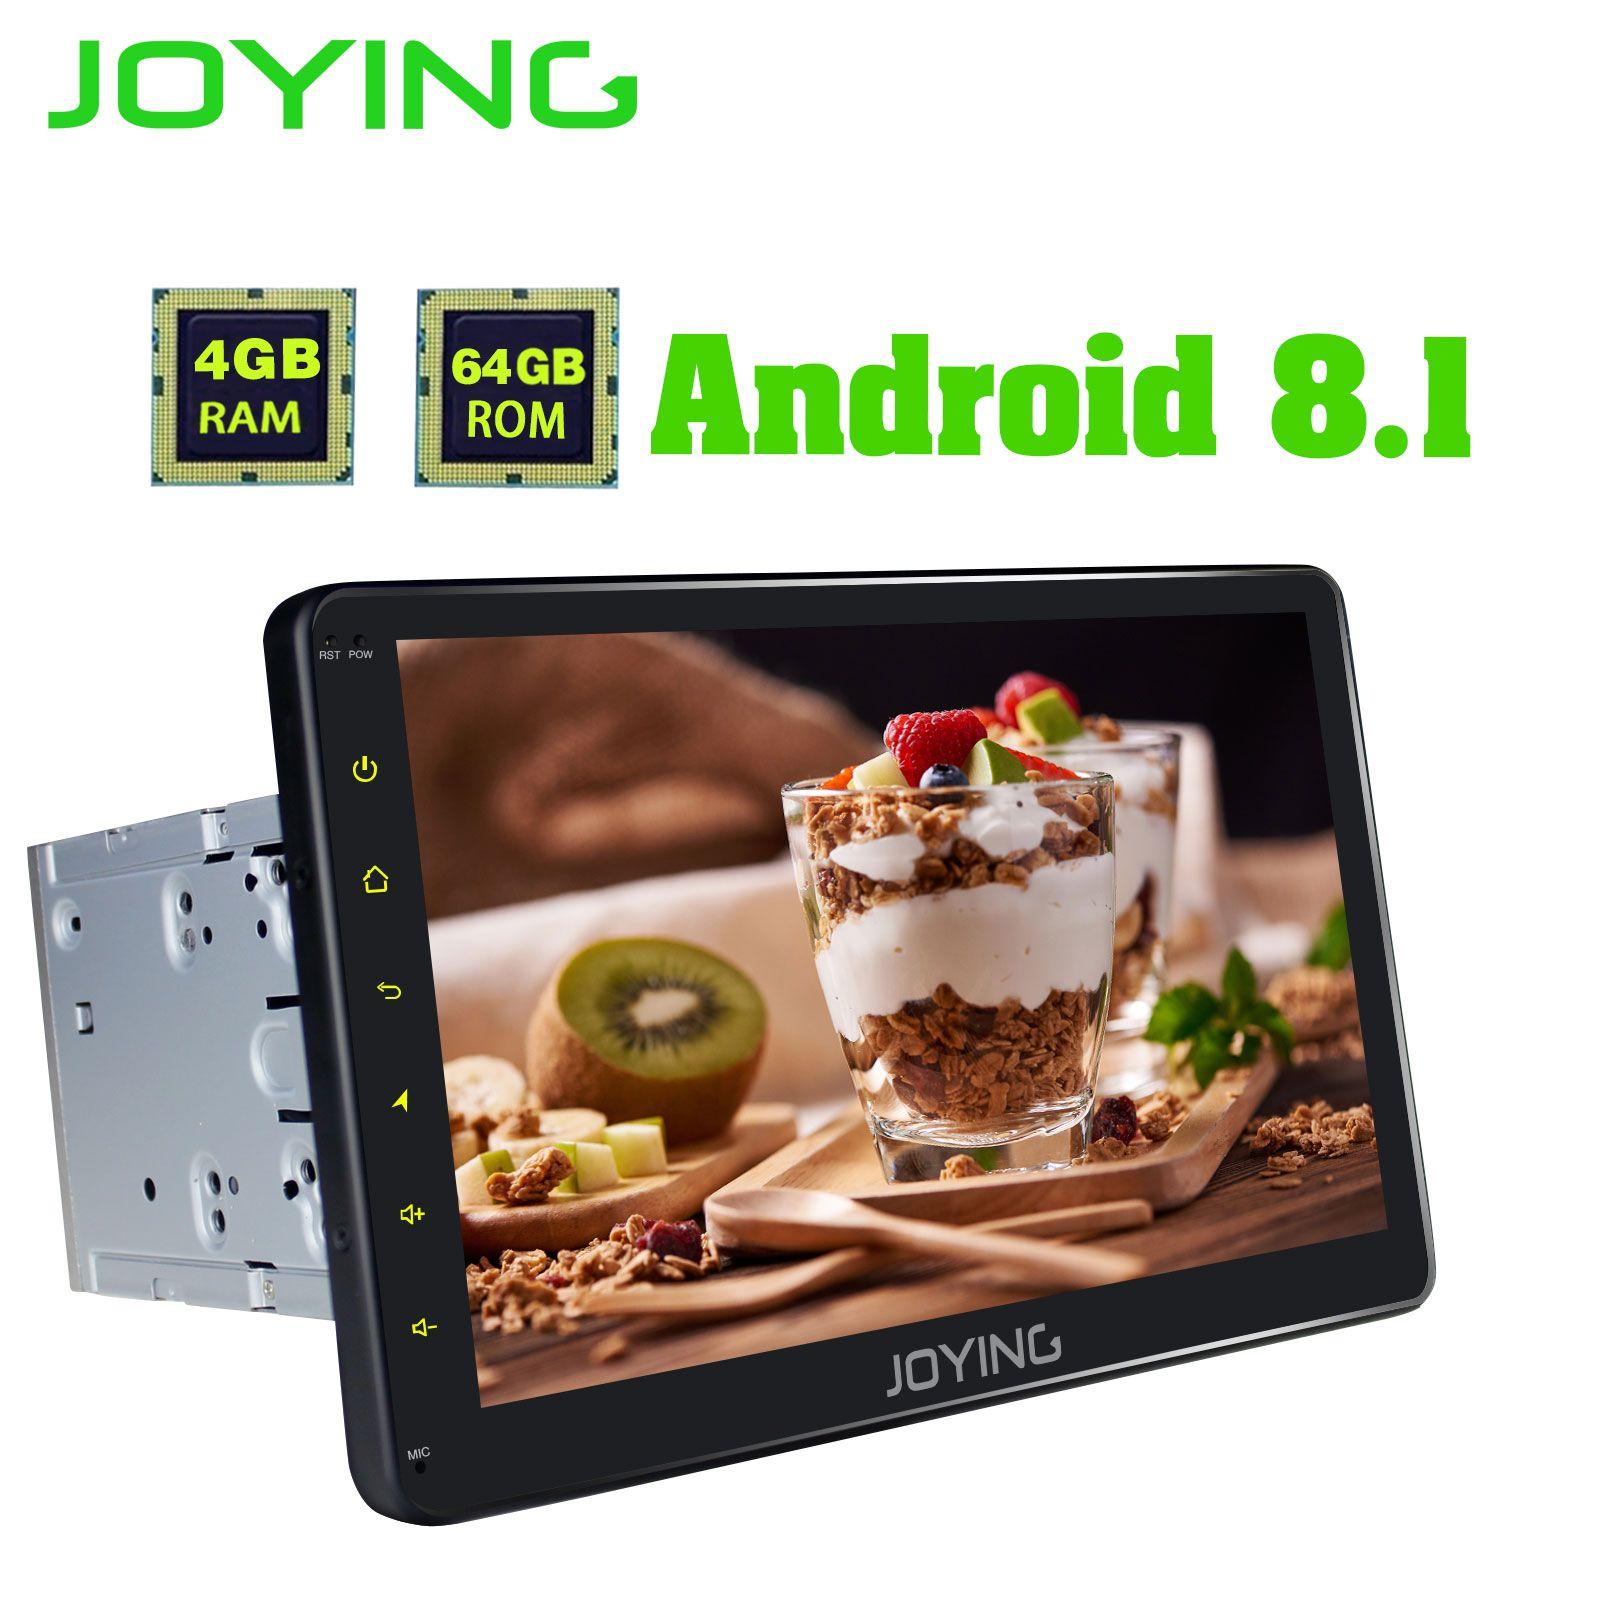 Android 8.1 2 din auto radio Octa Core 4GB + 64GB 10,1 IPS 1280*720 HD unterstützung 4G/wireless Carplay/DSP/SWC radio cassette player